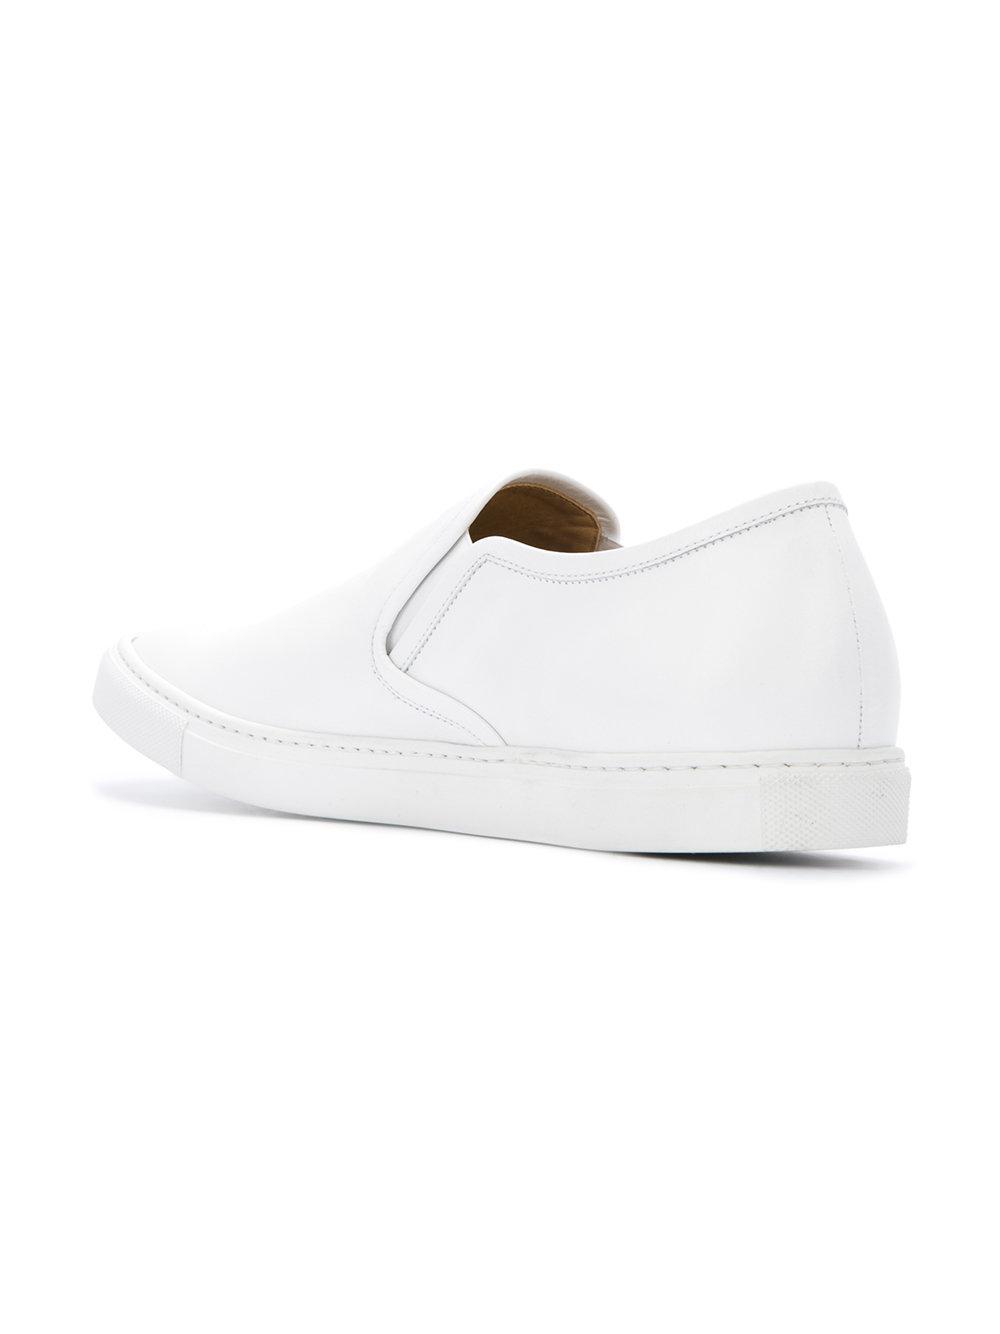 slip-on platform sneakers - White Cerruti F5AB8